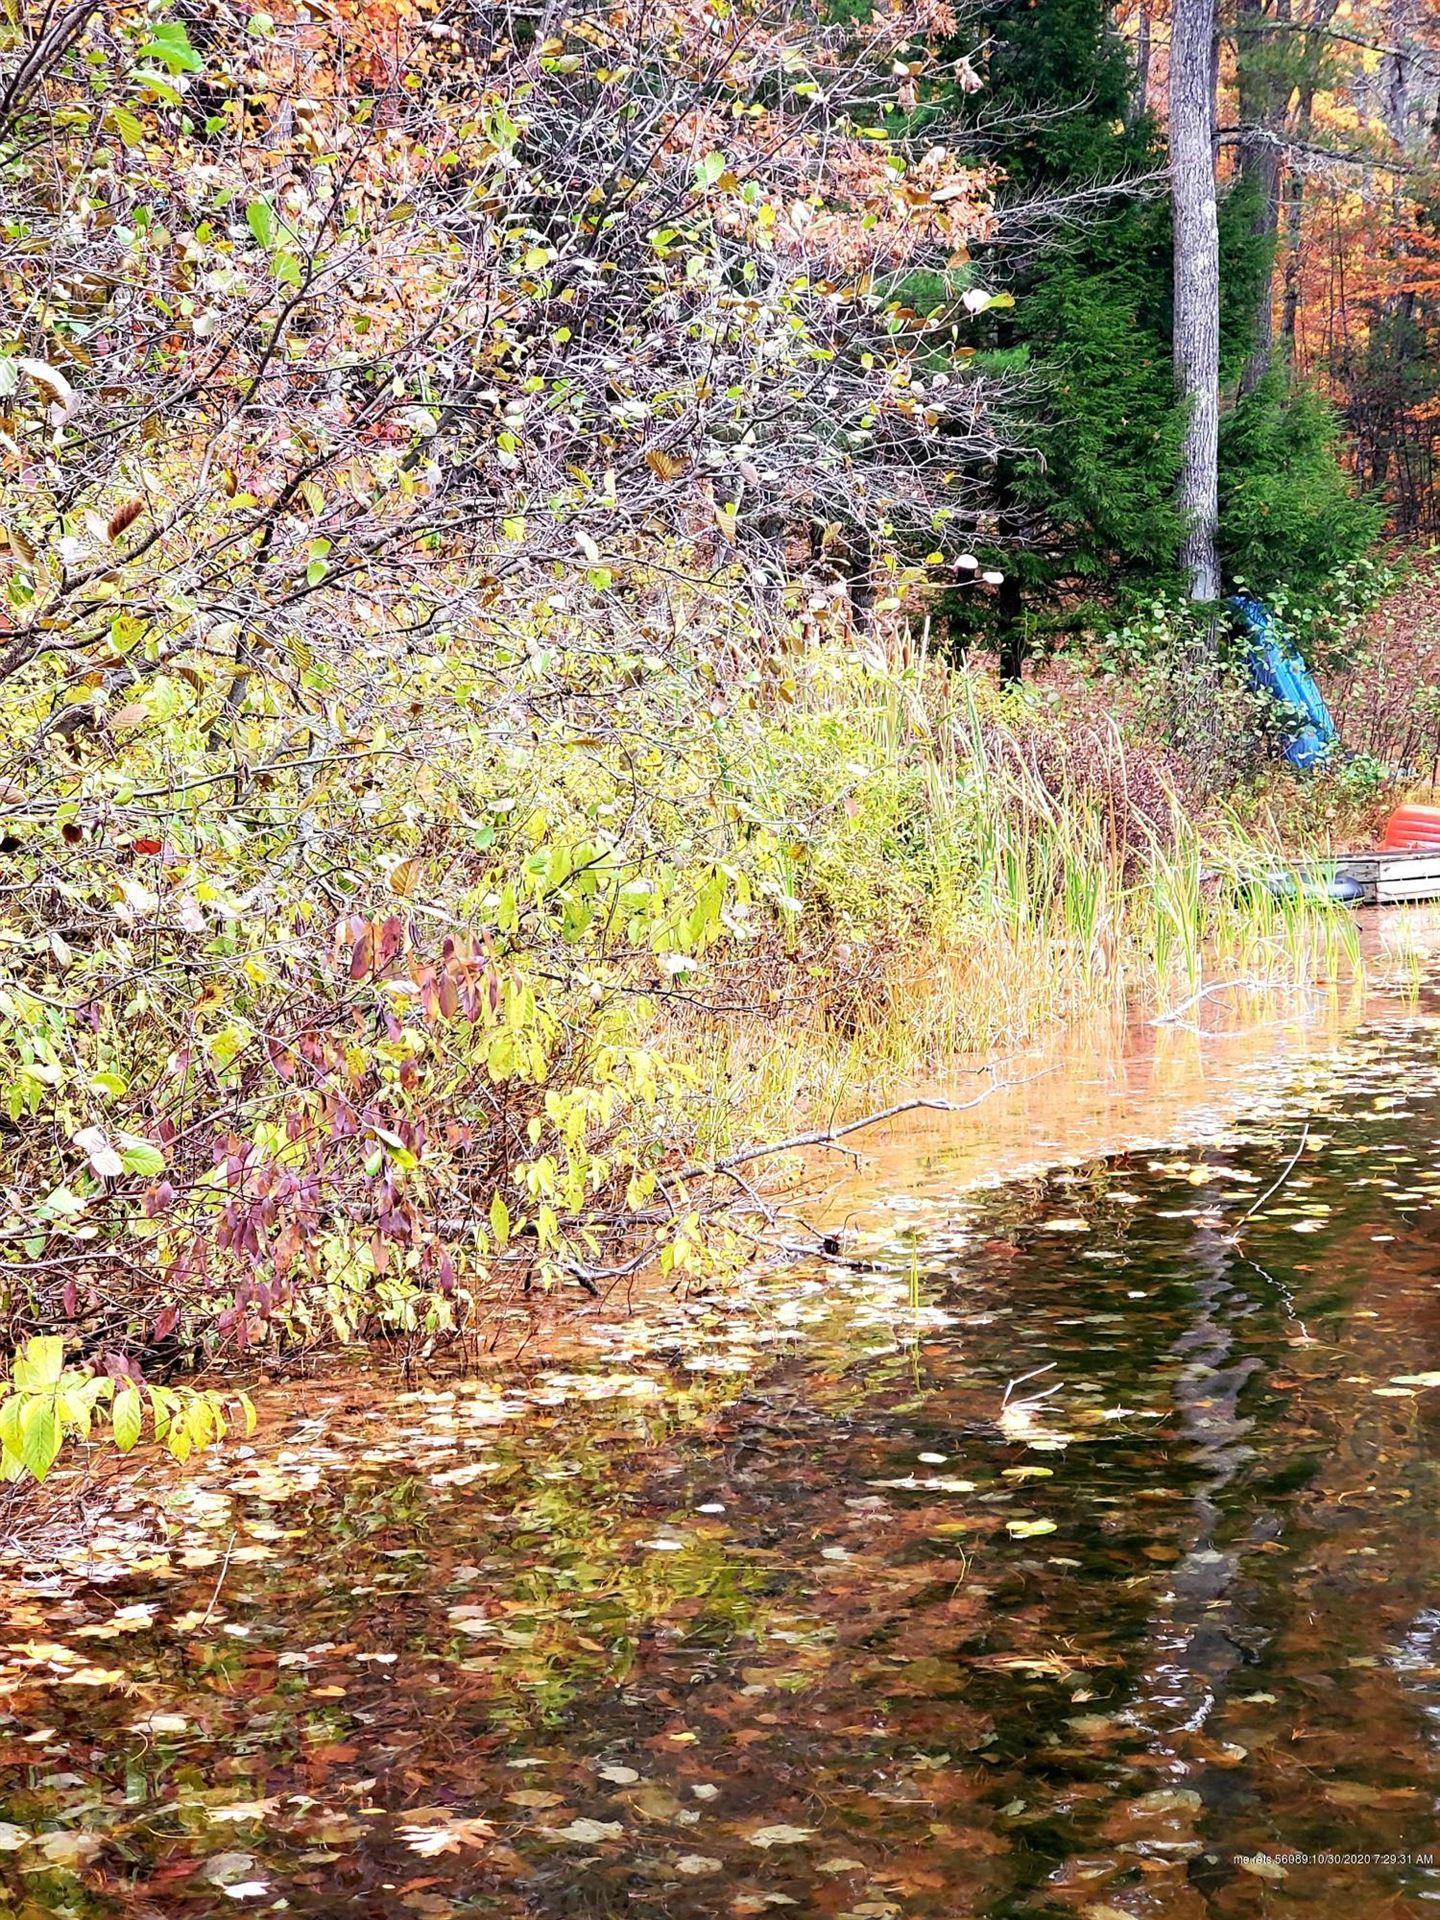 Photo of 0 Stanley Shores Road, Hiram, ME 04041 (MLS # 1474341)